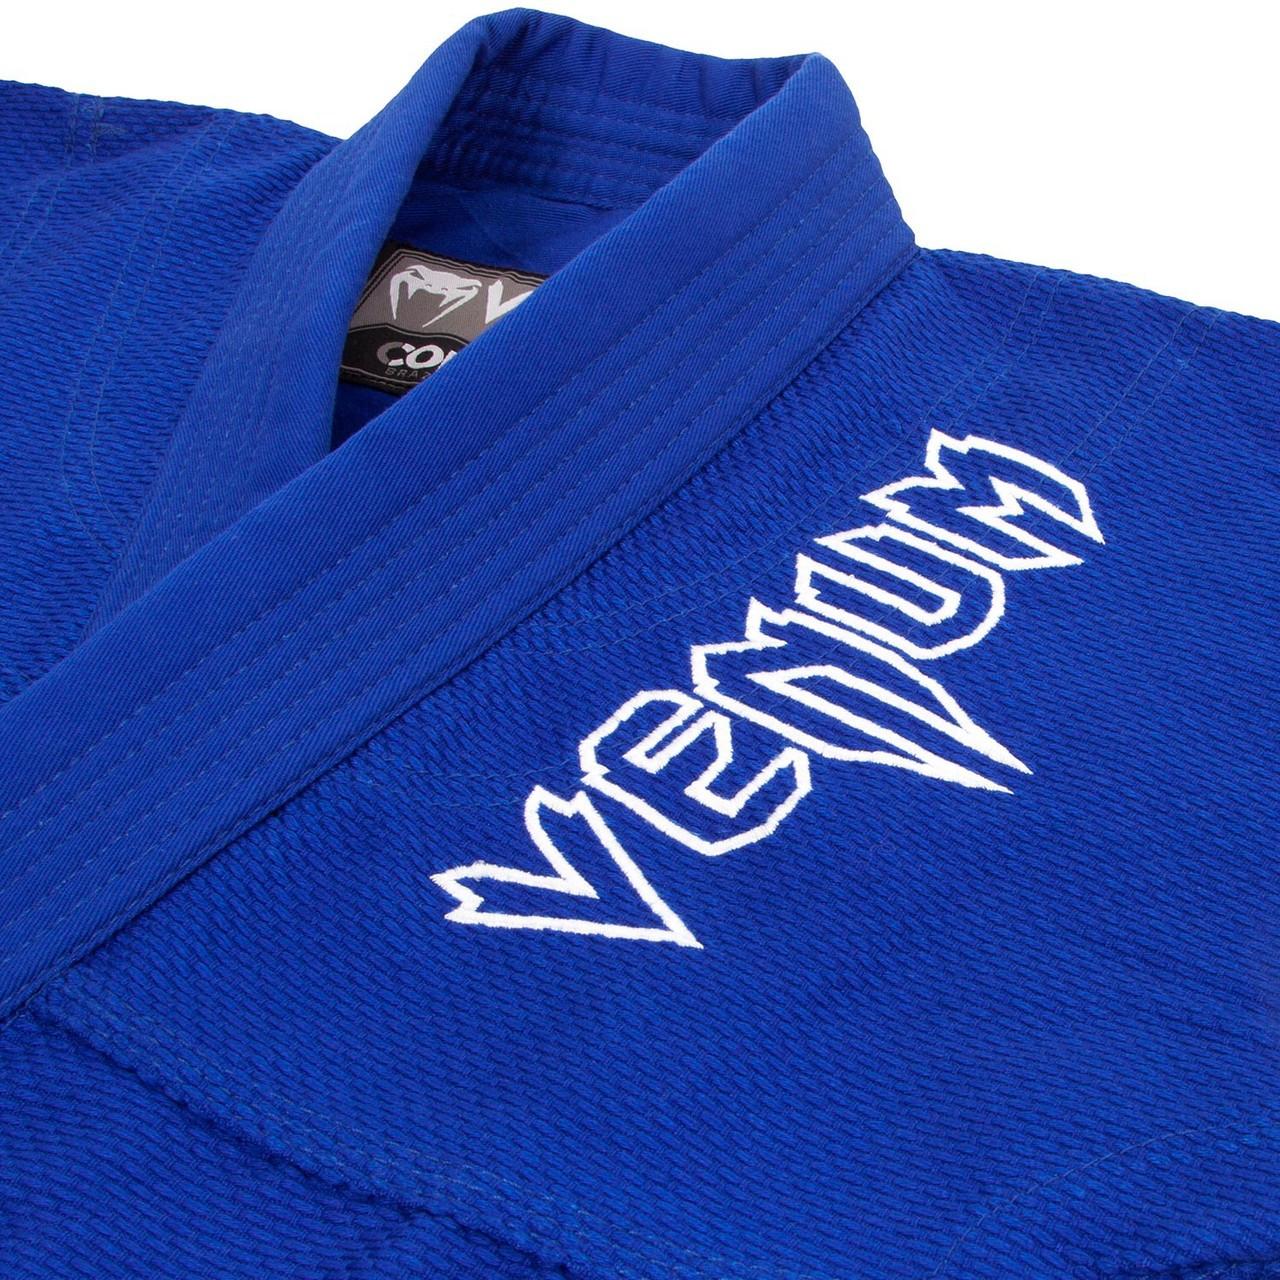 Venum Contender 2.0 Blue BJJ GI available at www.thejiujitsushop.com  Enjoy Free Shipping from The Jiu Jitsu Shop today!